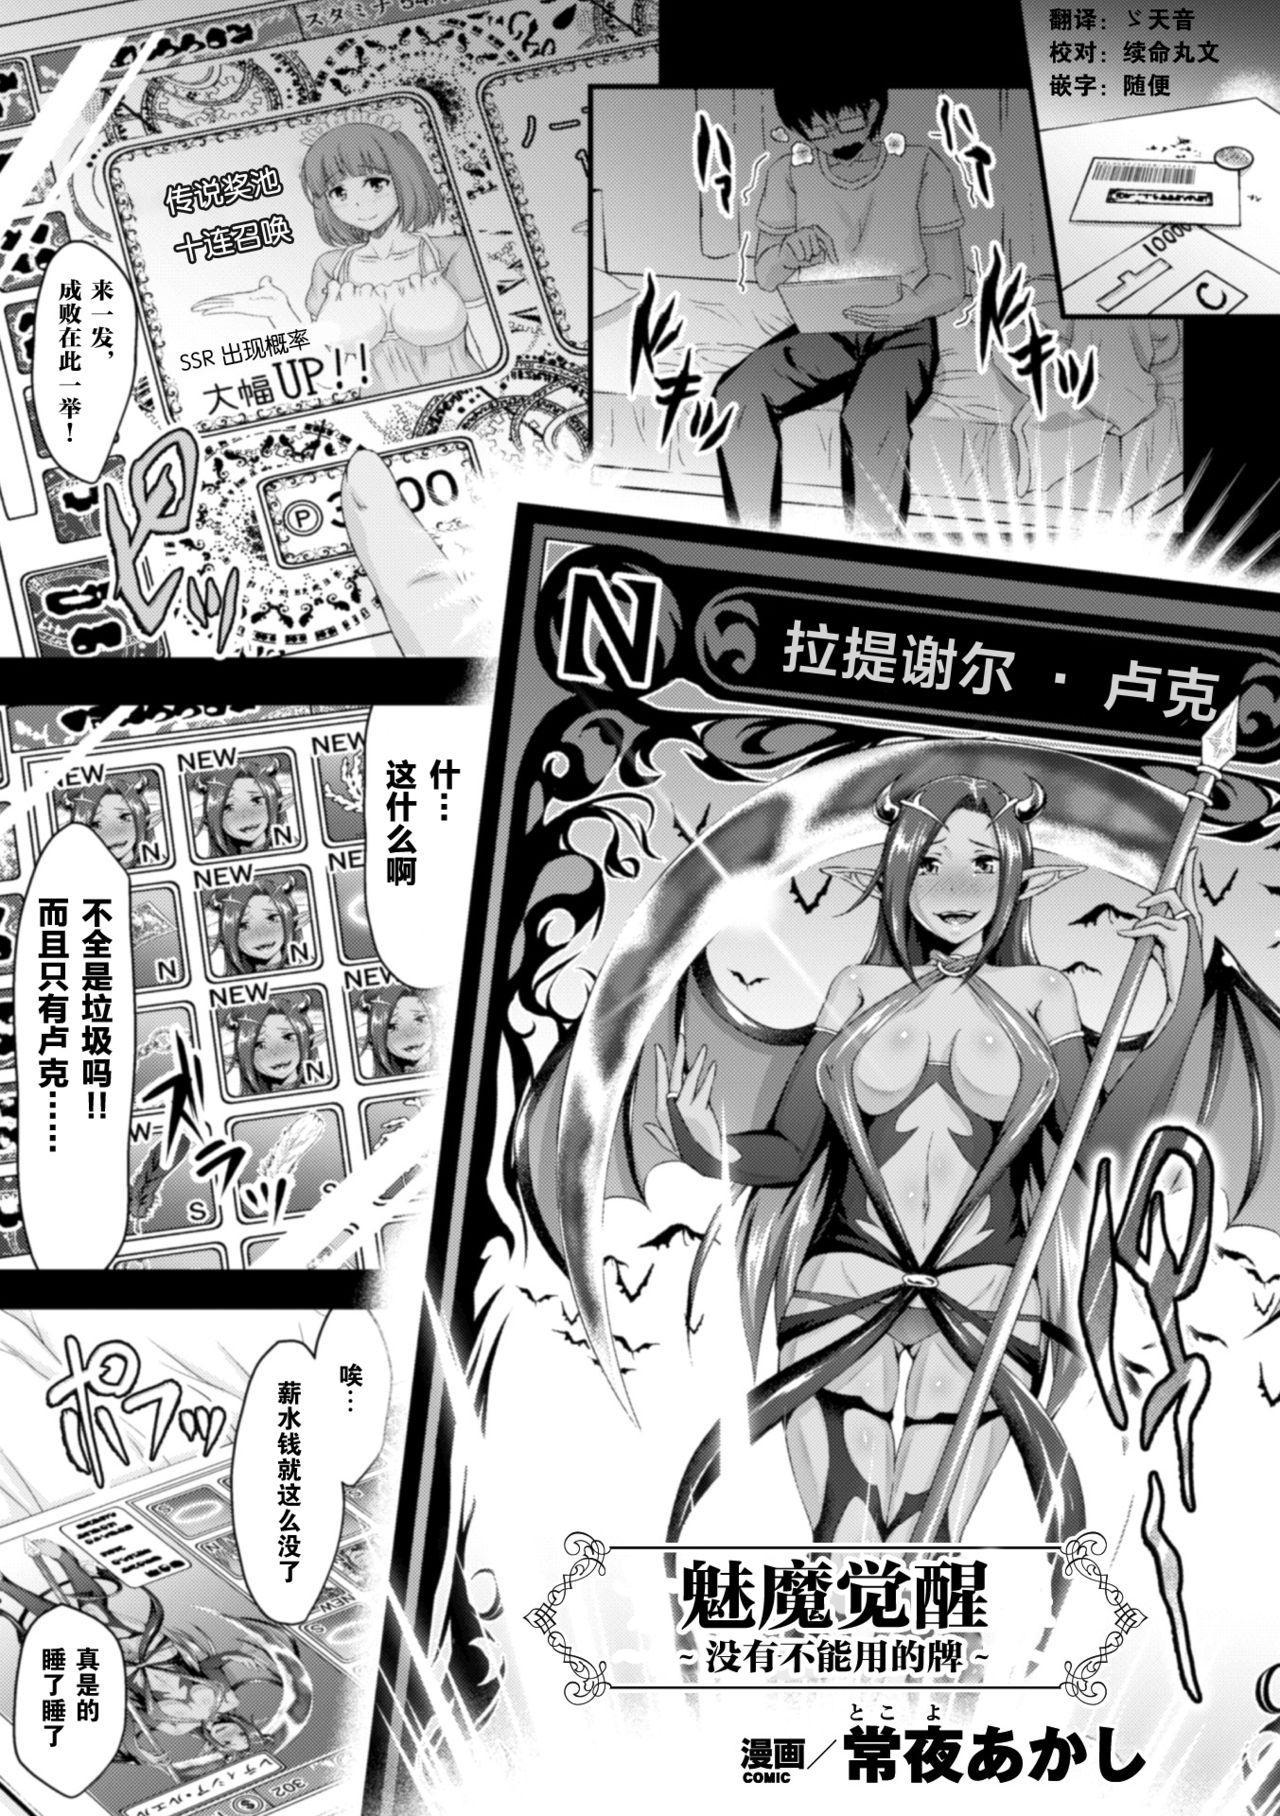 2D Comic Magazine Tenshi ni Ochiru Akuma-tachi Vol. 1 64